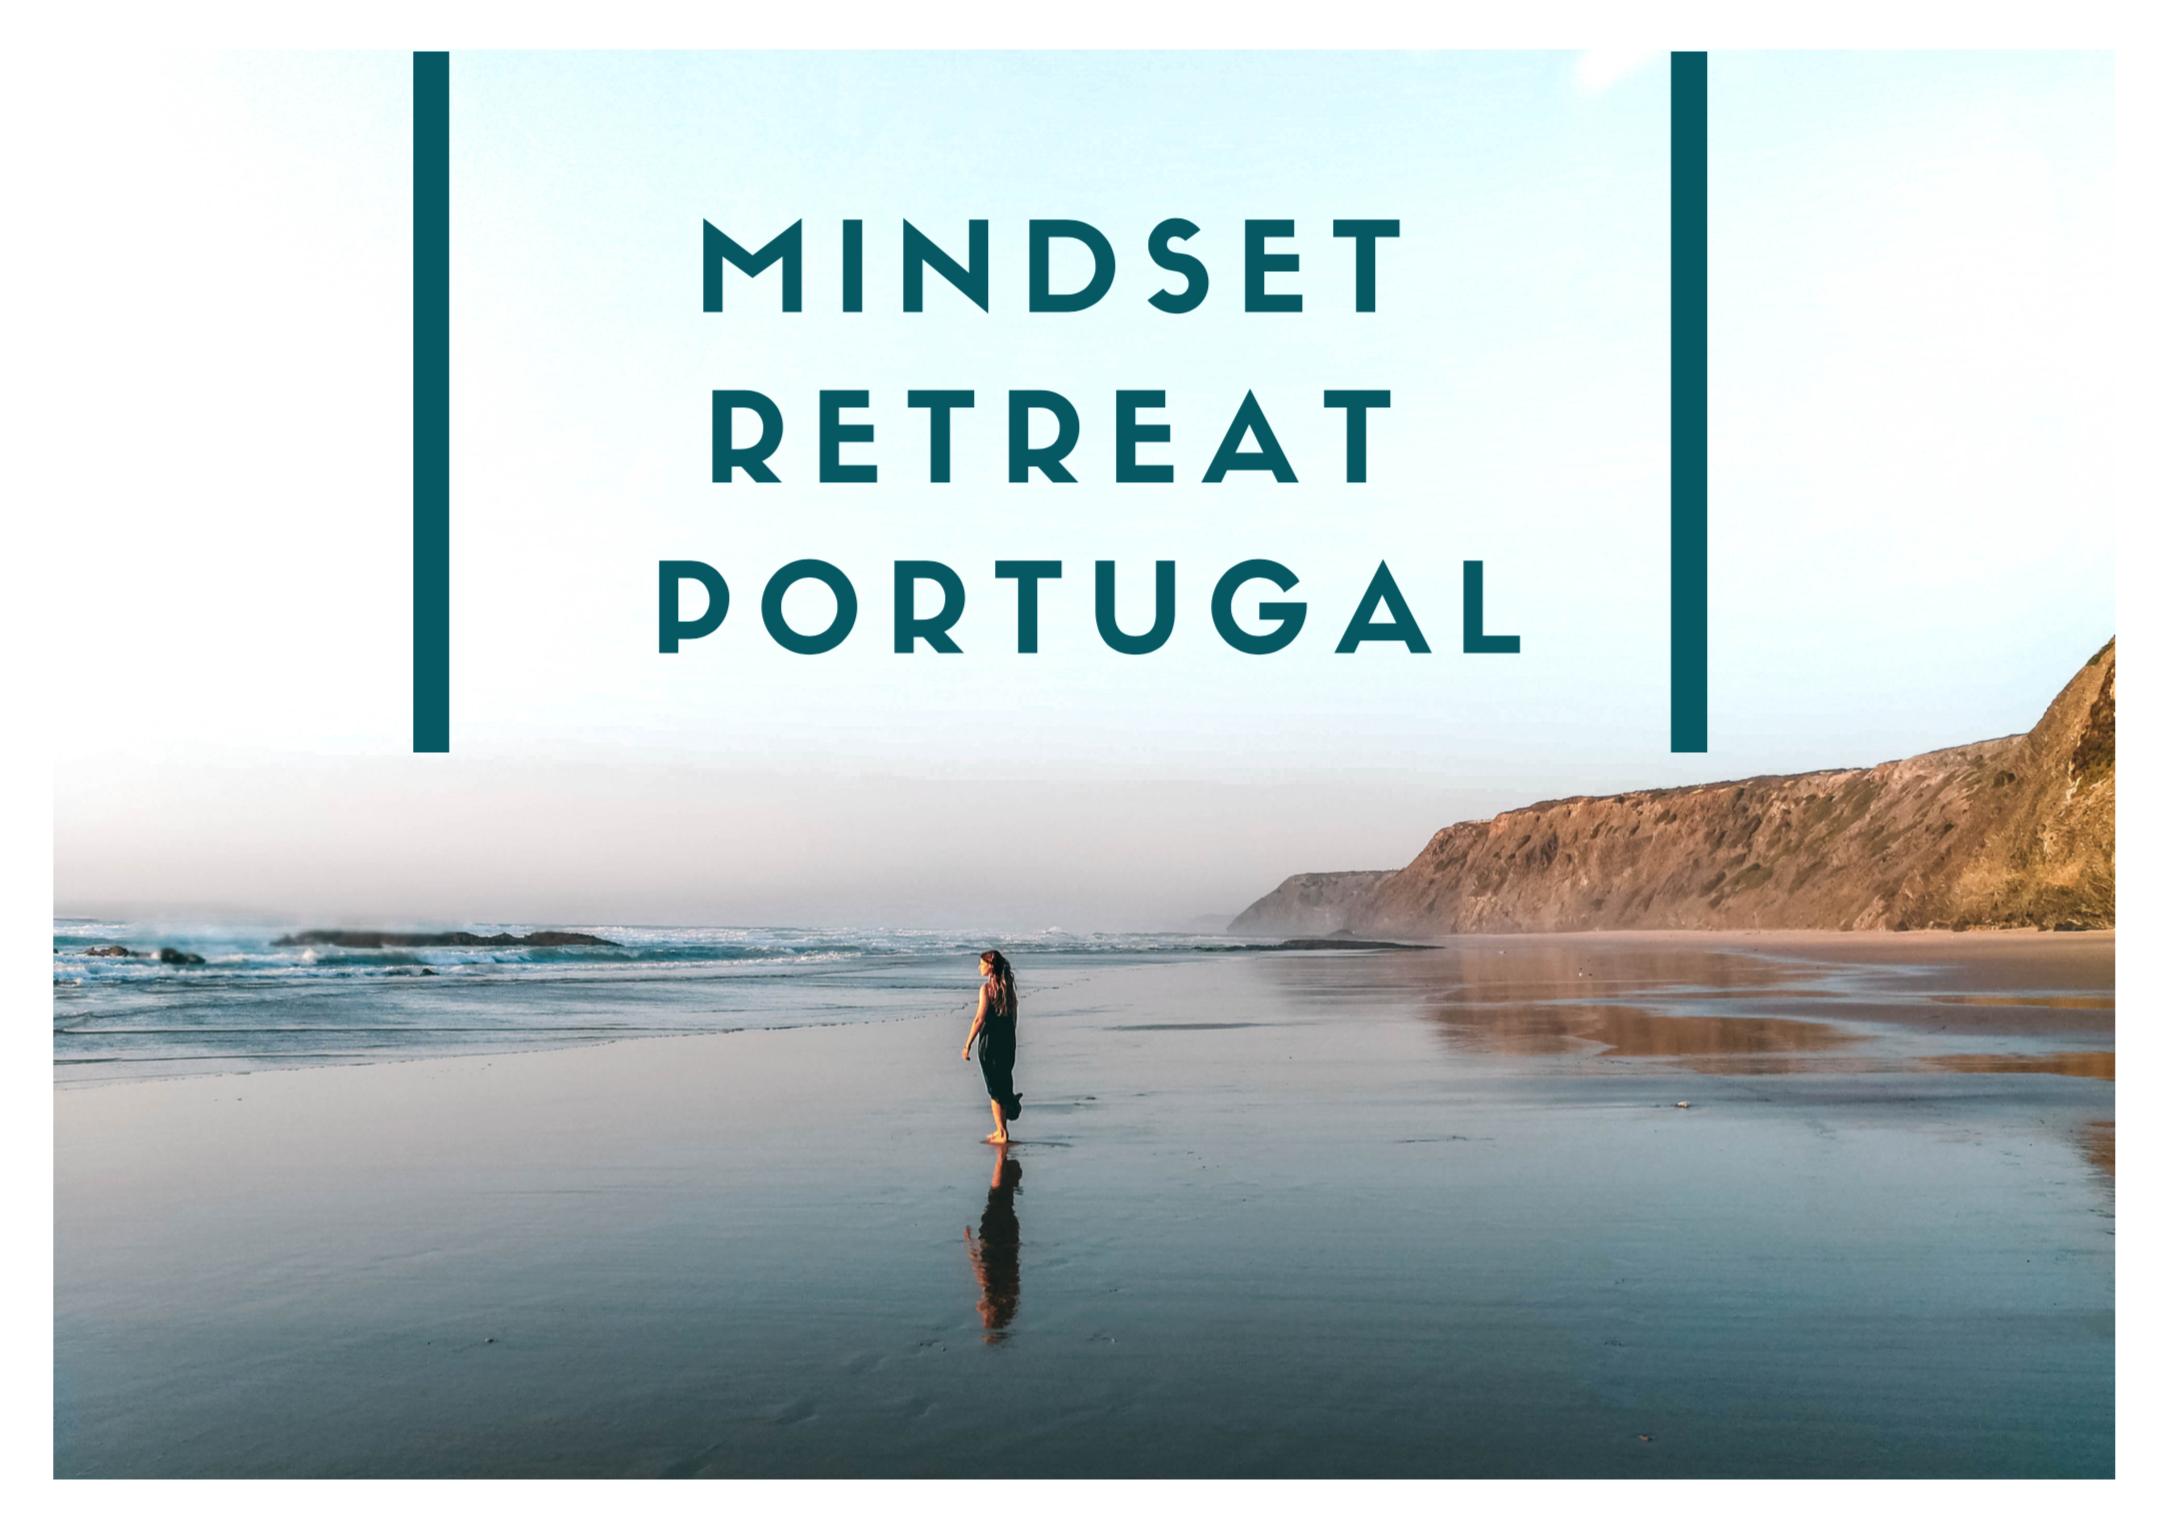 Mindset Referat Portugal